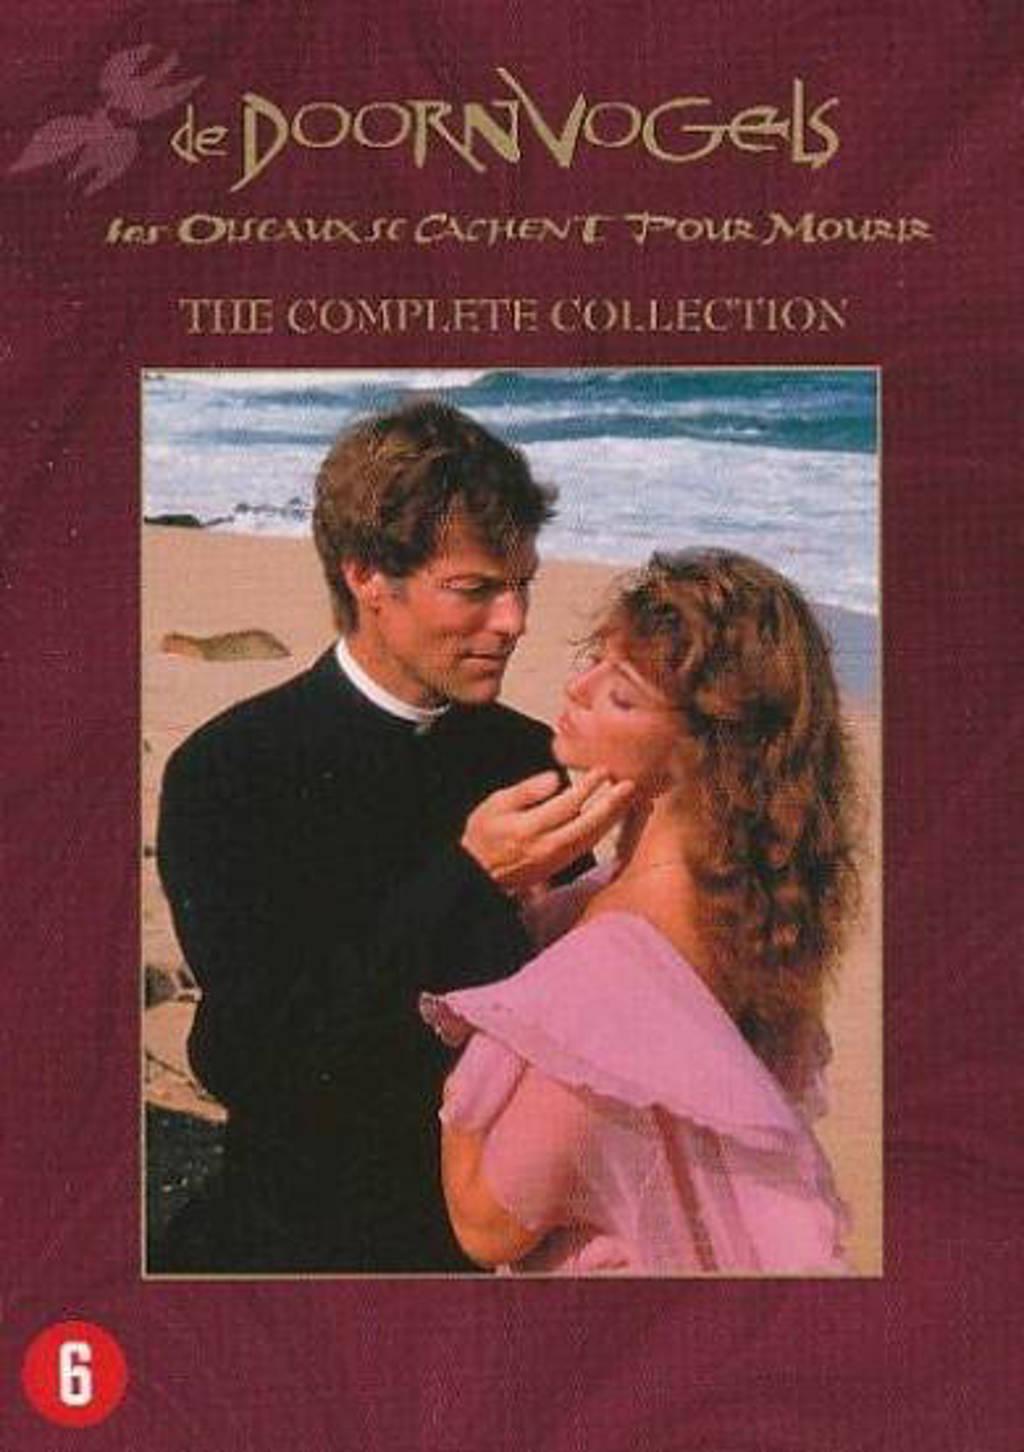 Doornvogels - Complete collection (DVD)